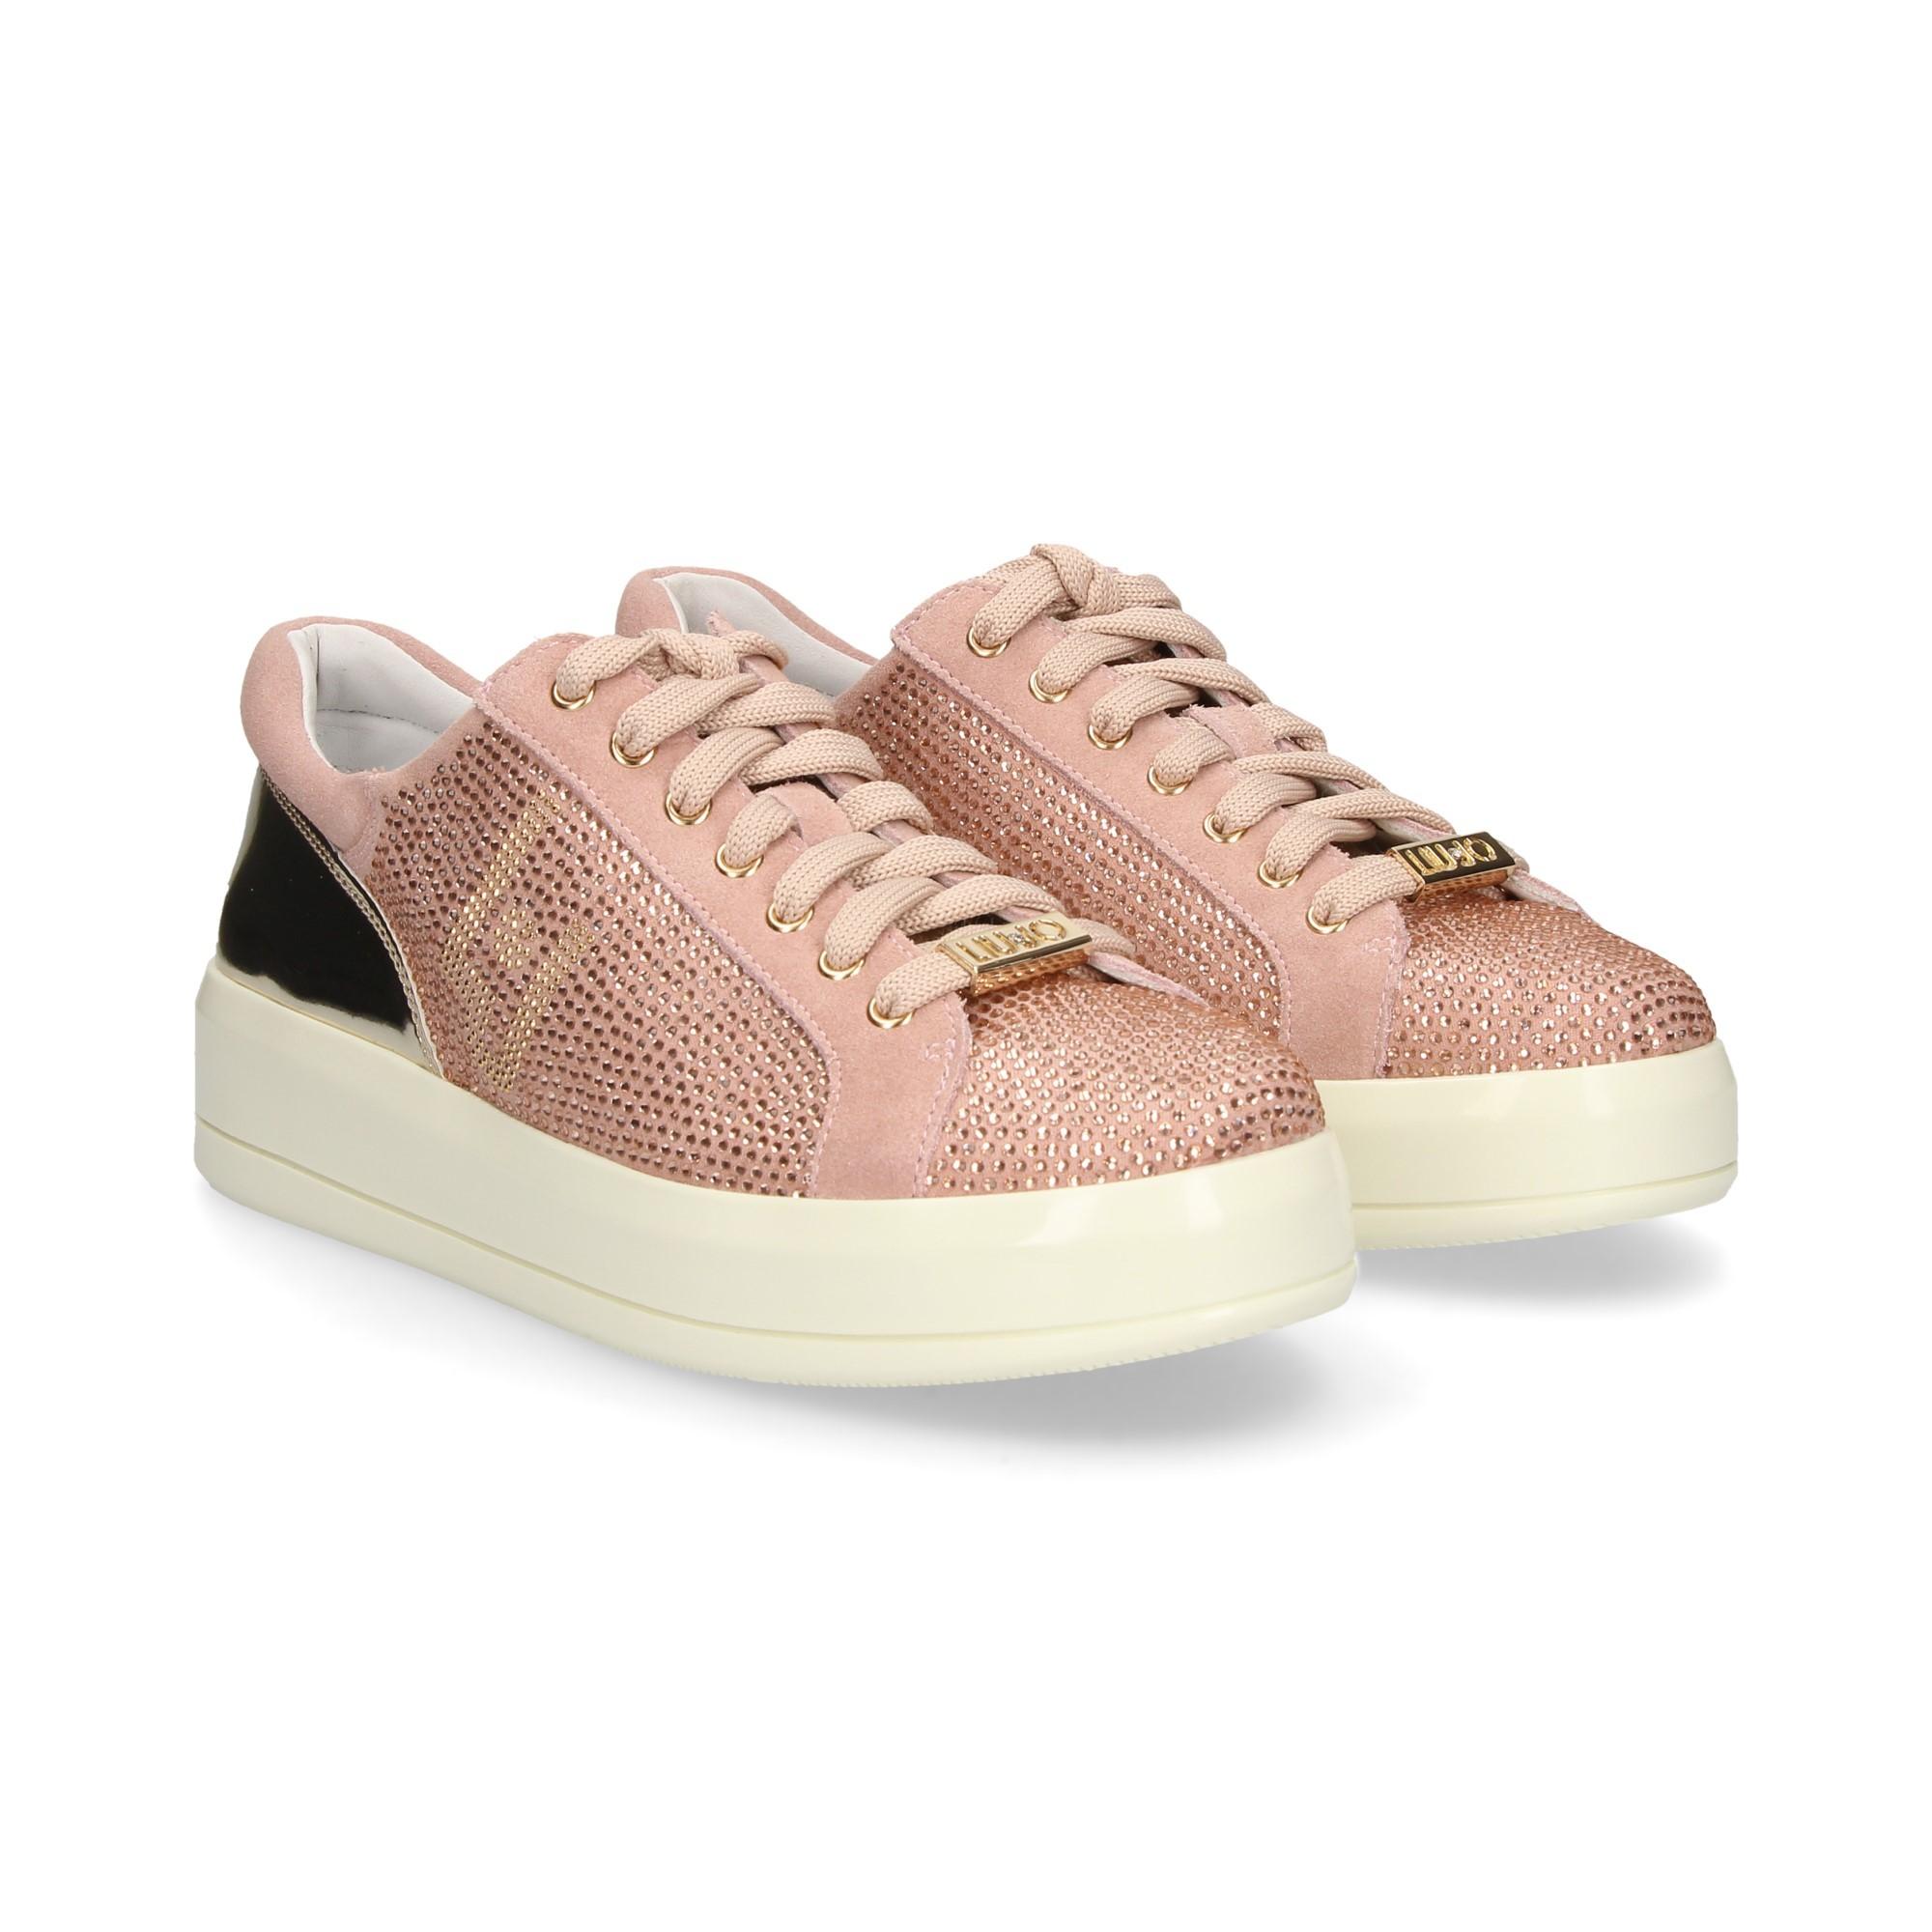 LIU·JO Women s Sneakers B19015 TX011 31406 PEACH 1e09e0598ab